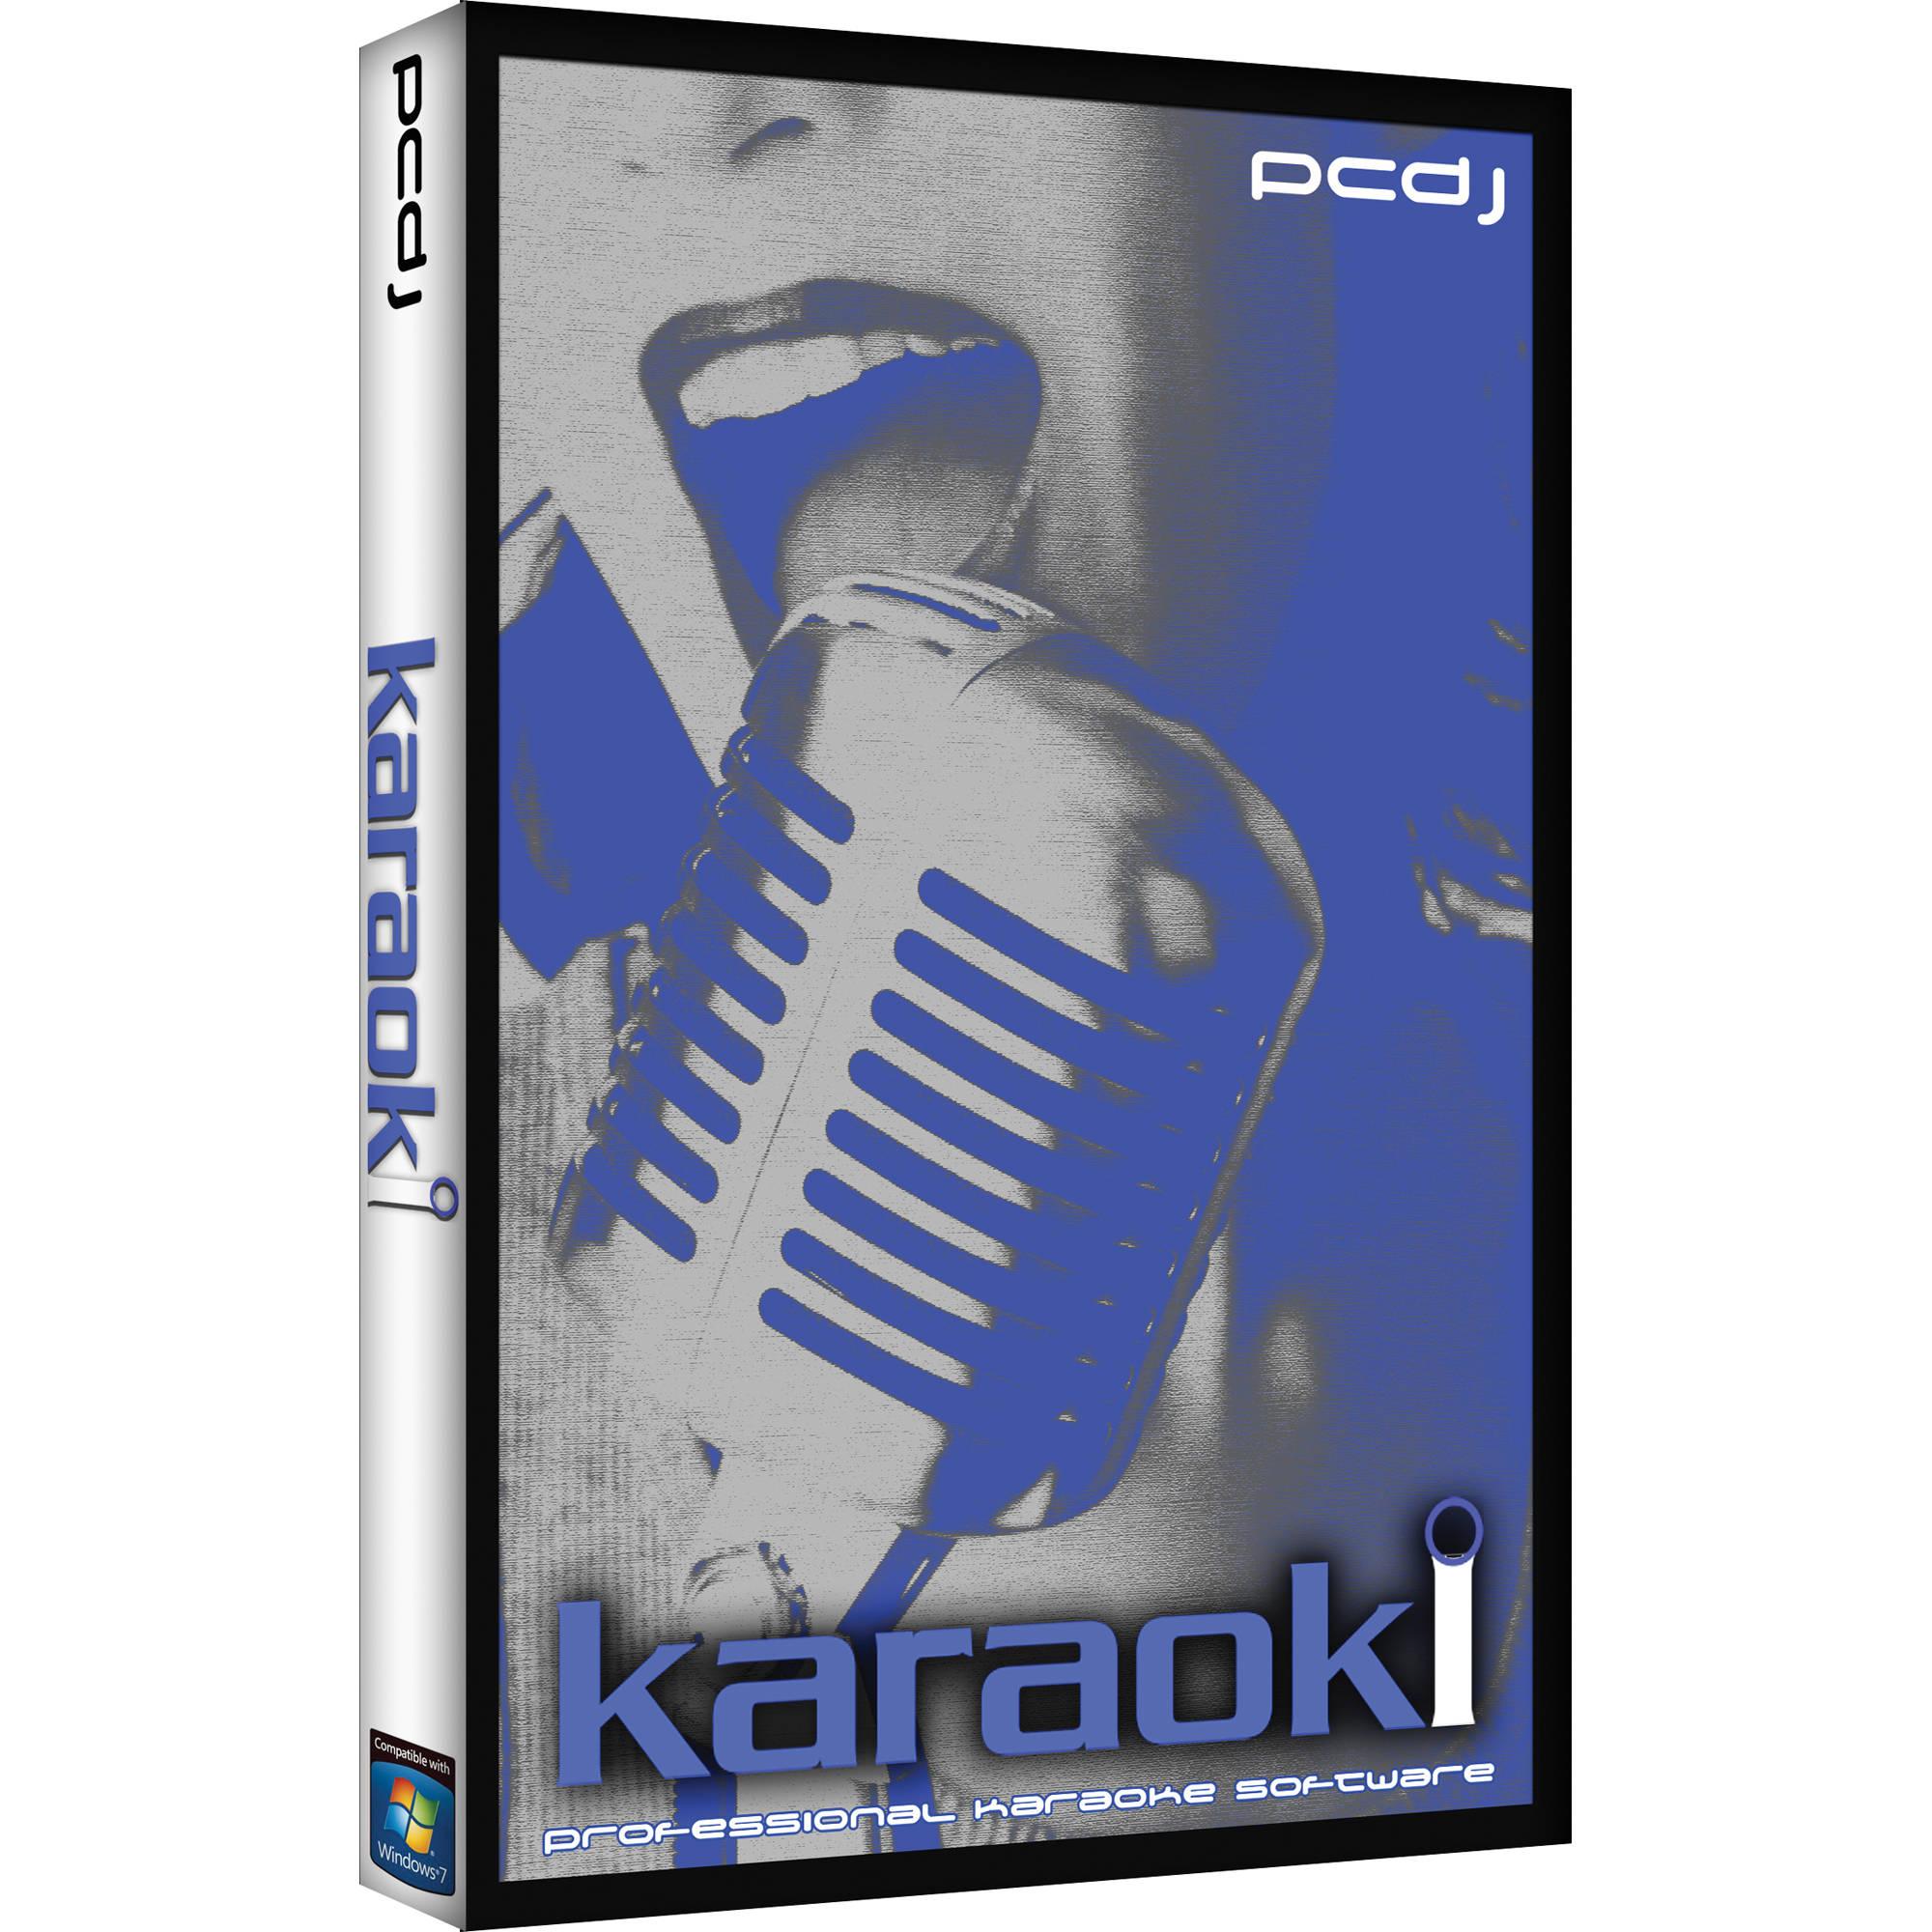 pcdj-karaoki---karaoke-software.jpg